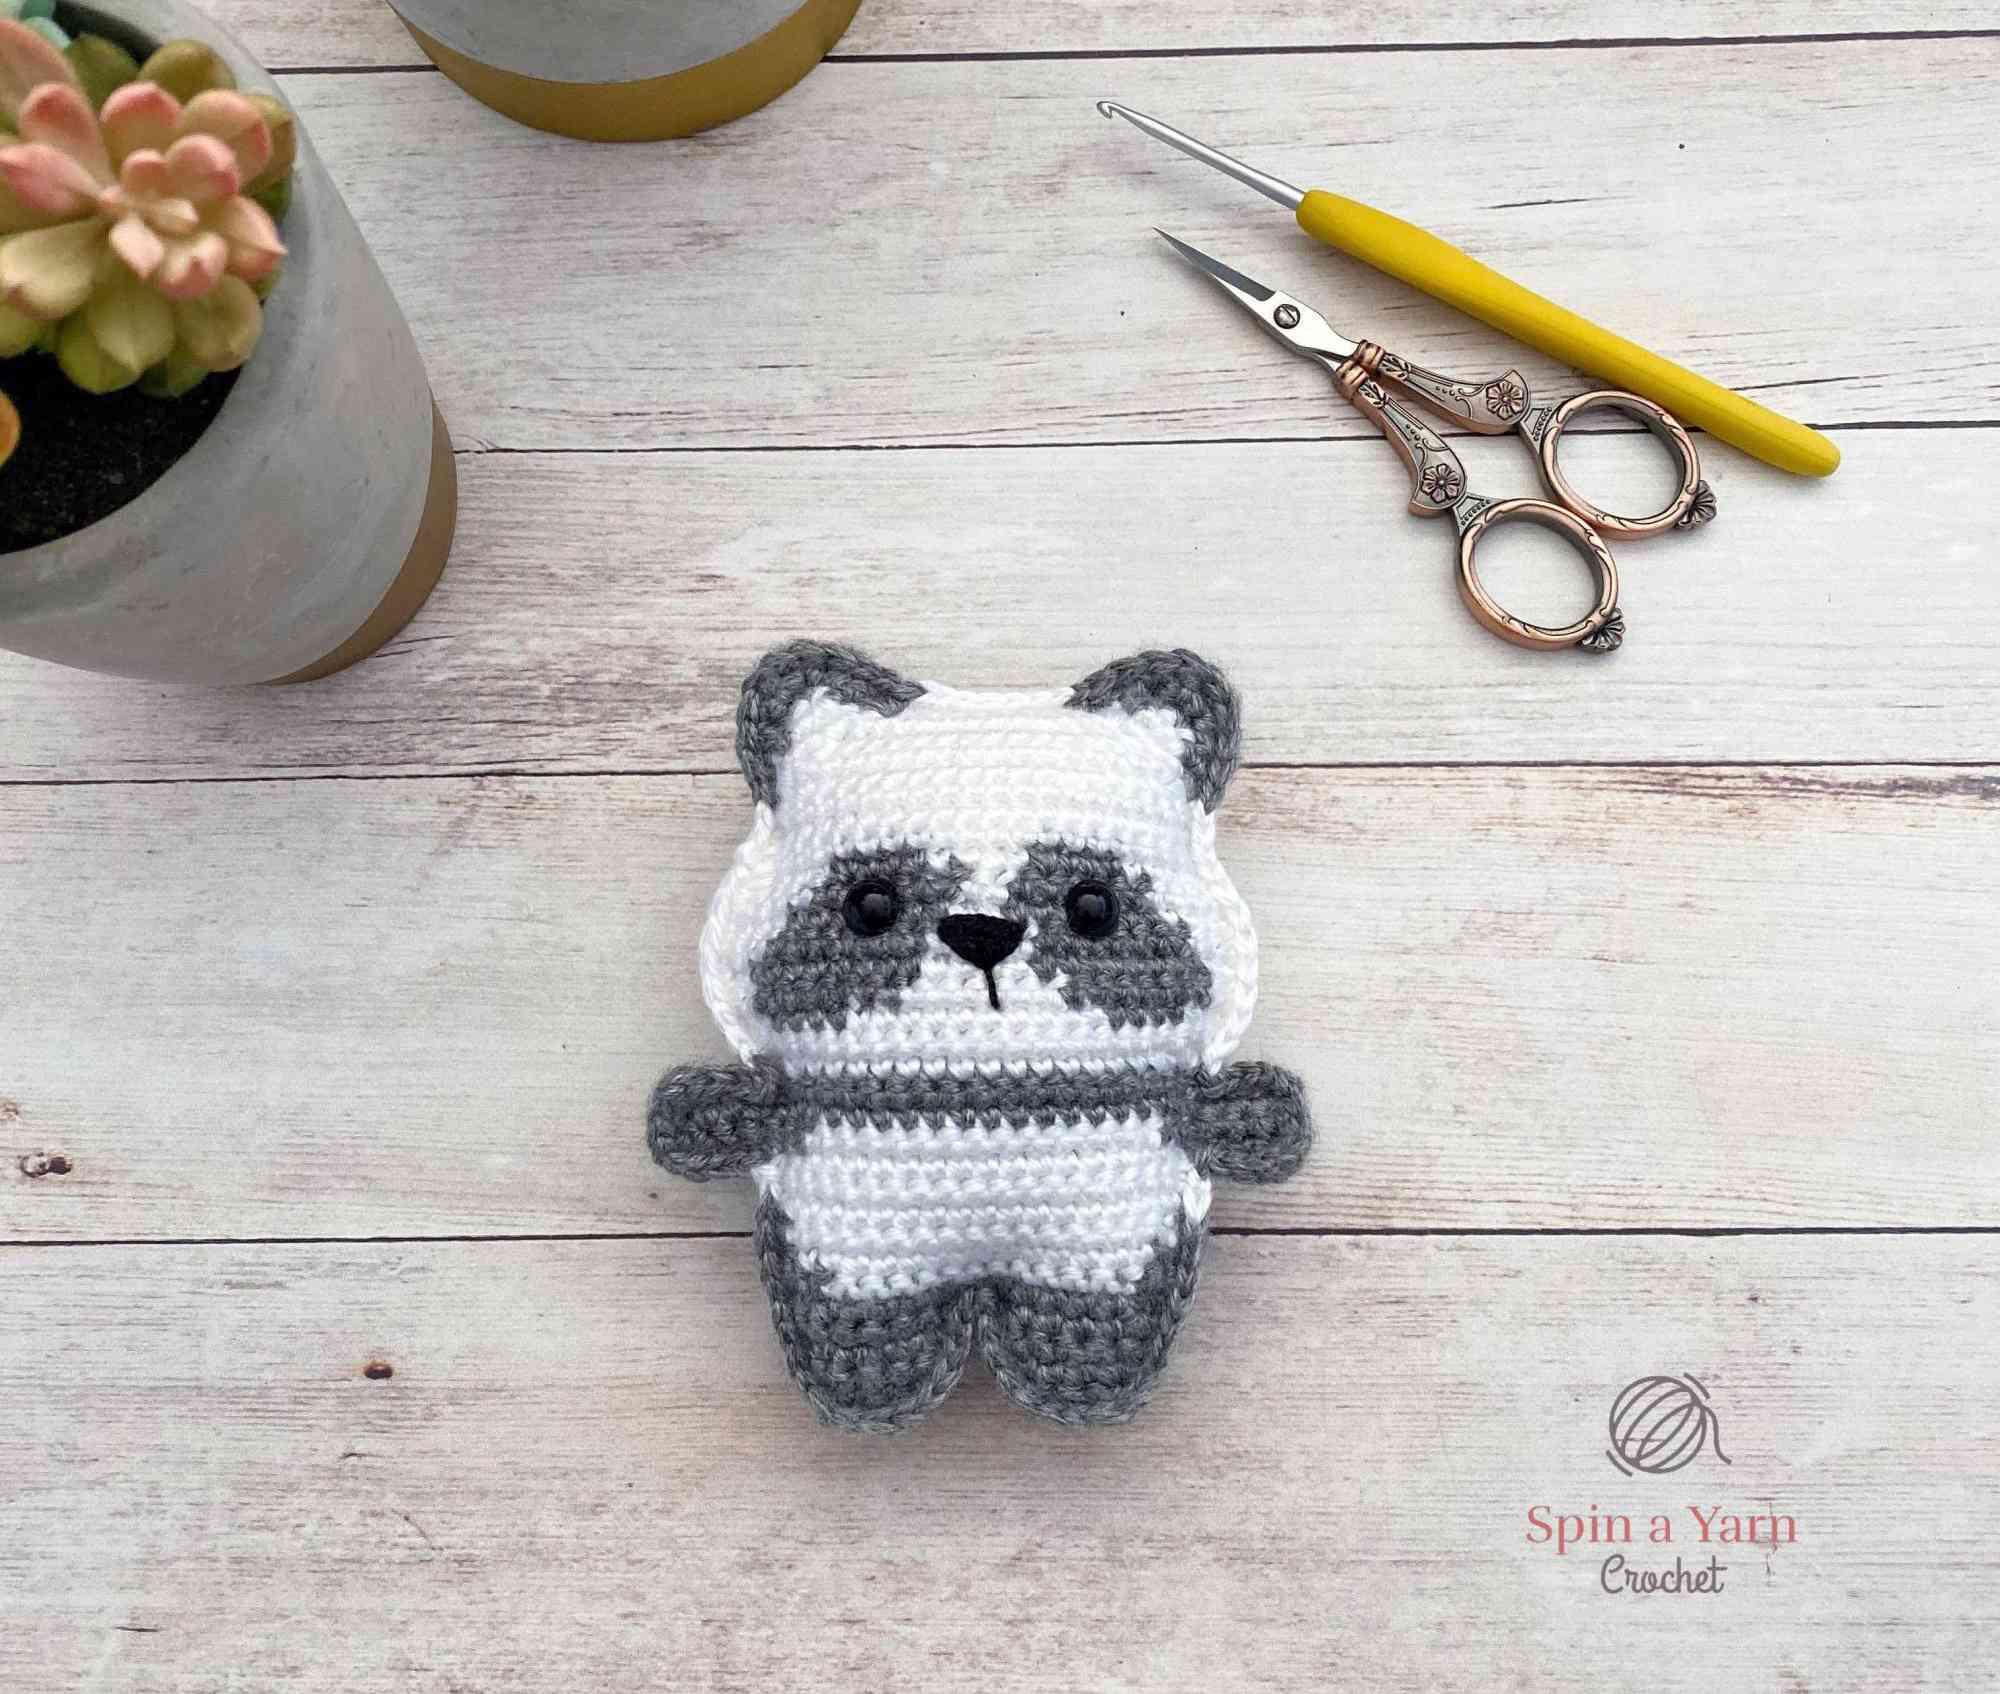 Pocket Panda Crocheted Toy Pattern